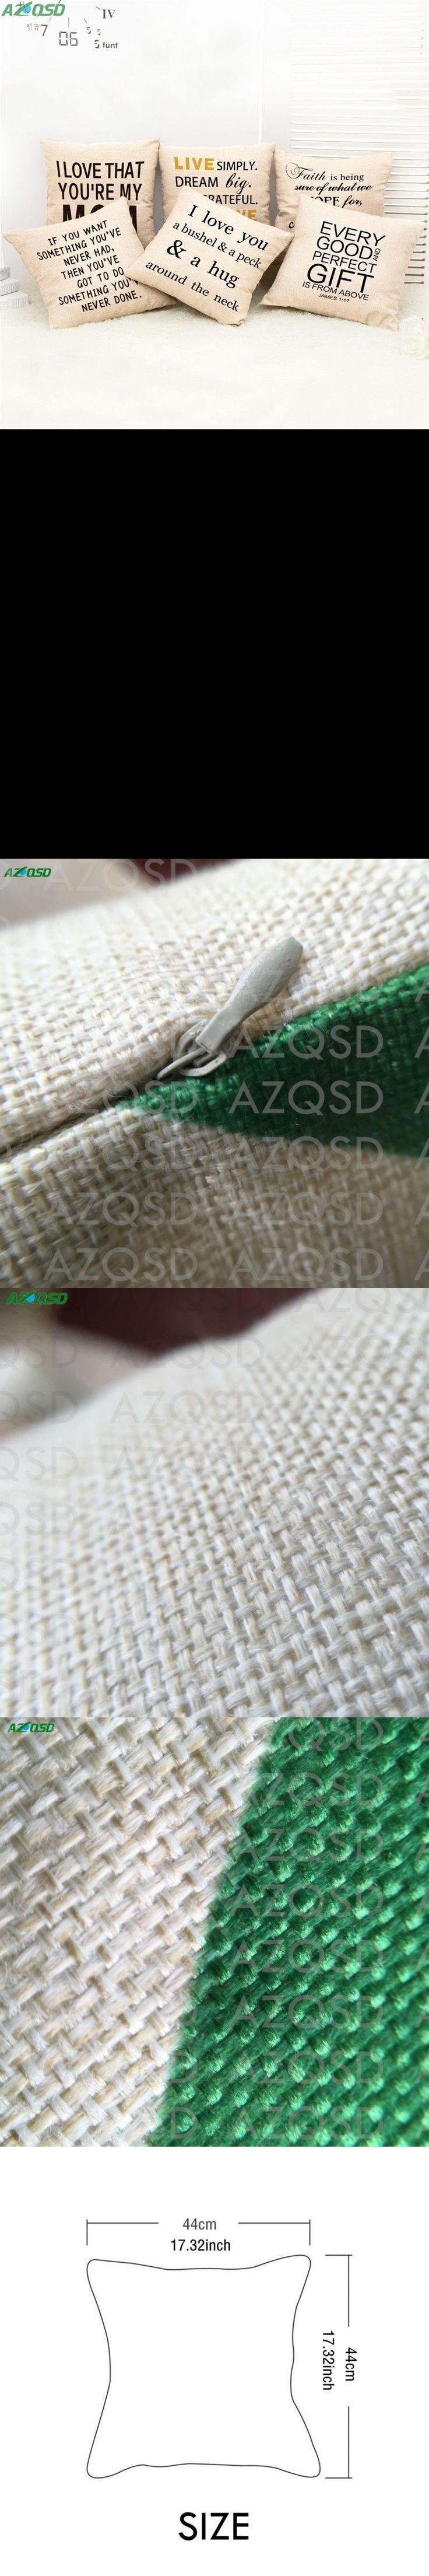 AZQSD Minimalist Cushion Cover English Sentences Decorative Pillow Case Seat Sofa Covers Home Decor capa de almofada BZ025 $10.49